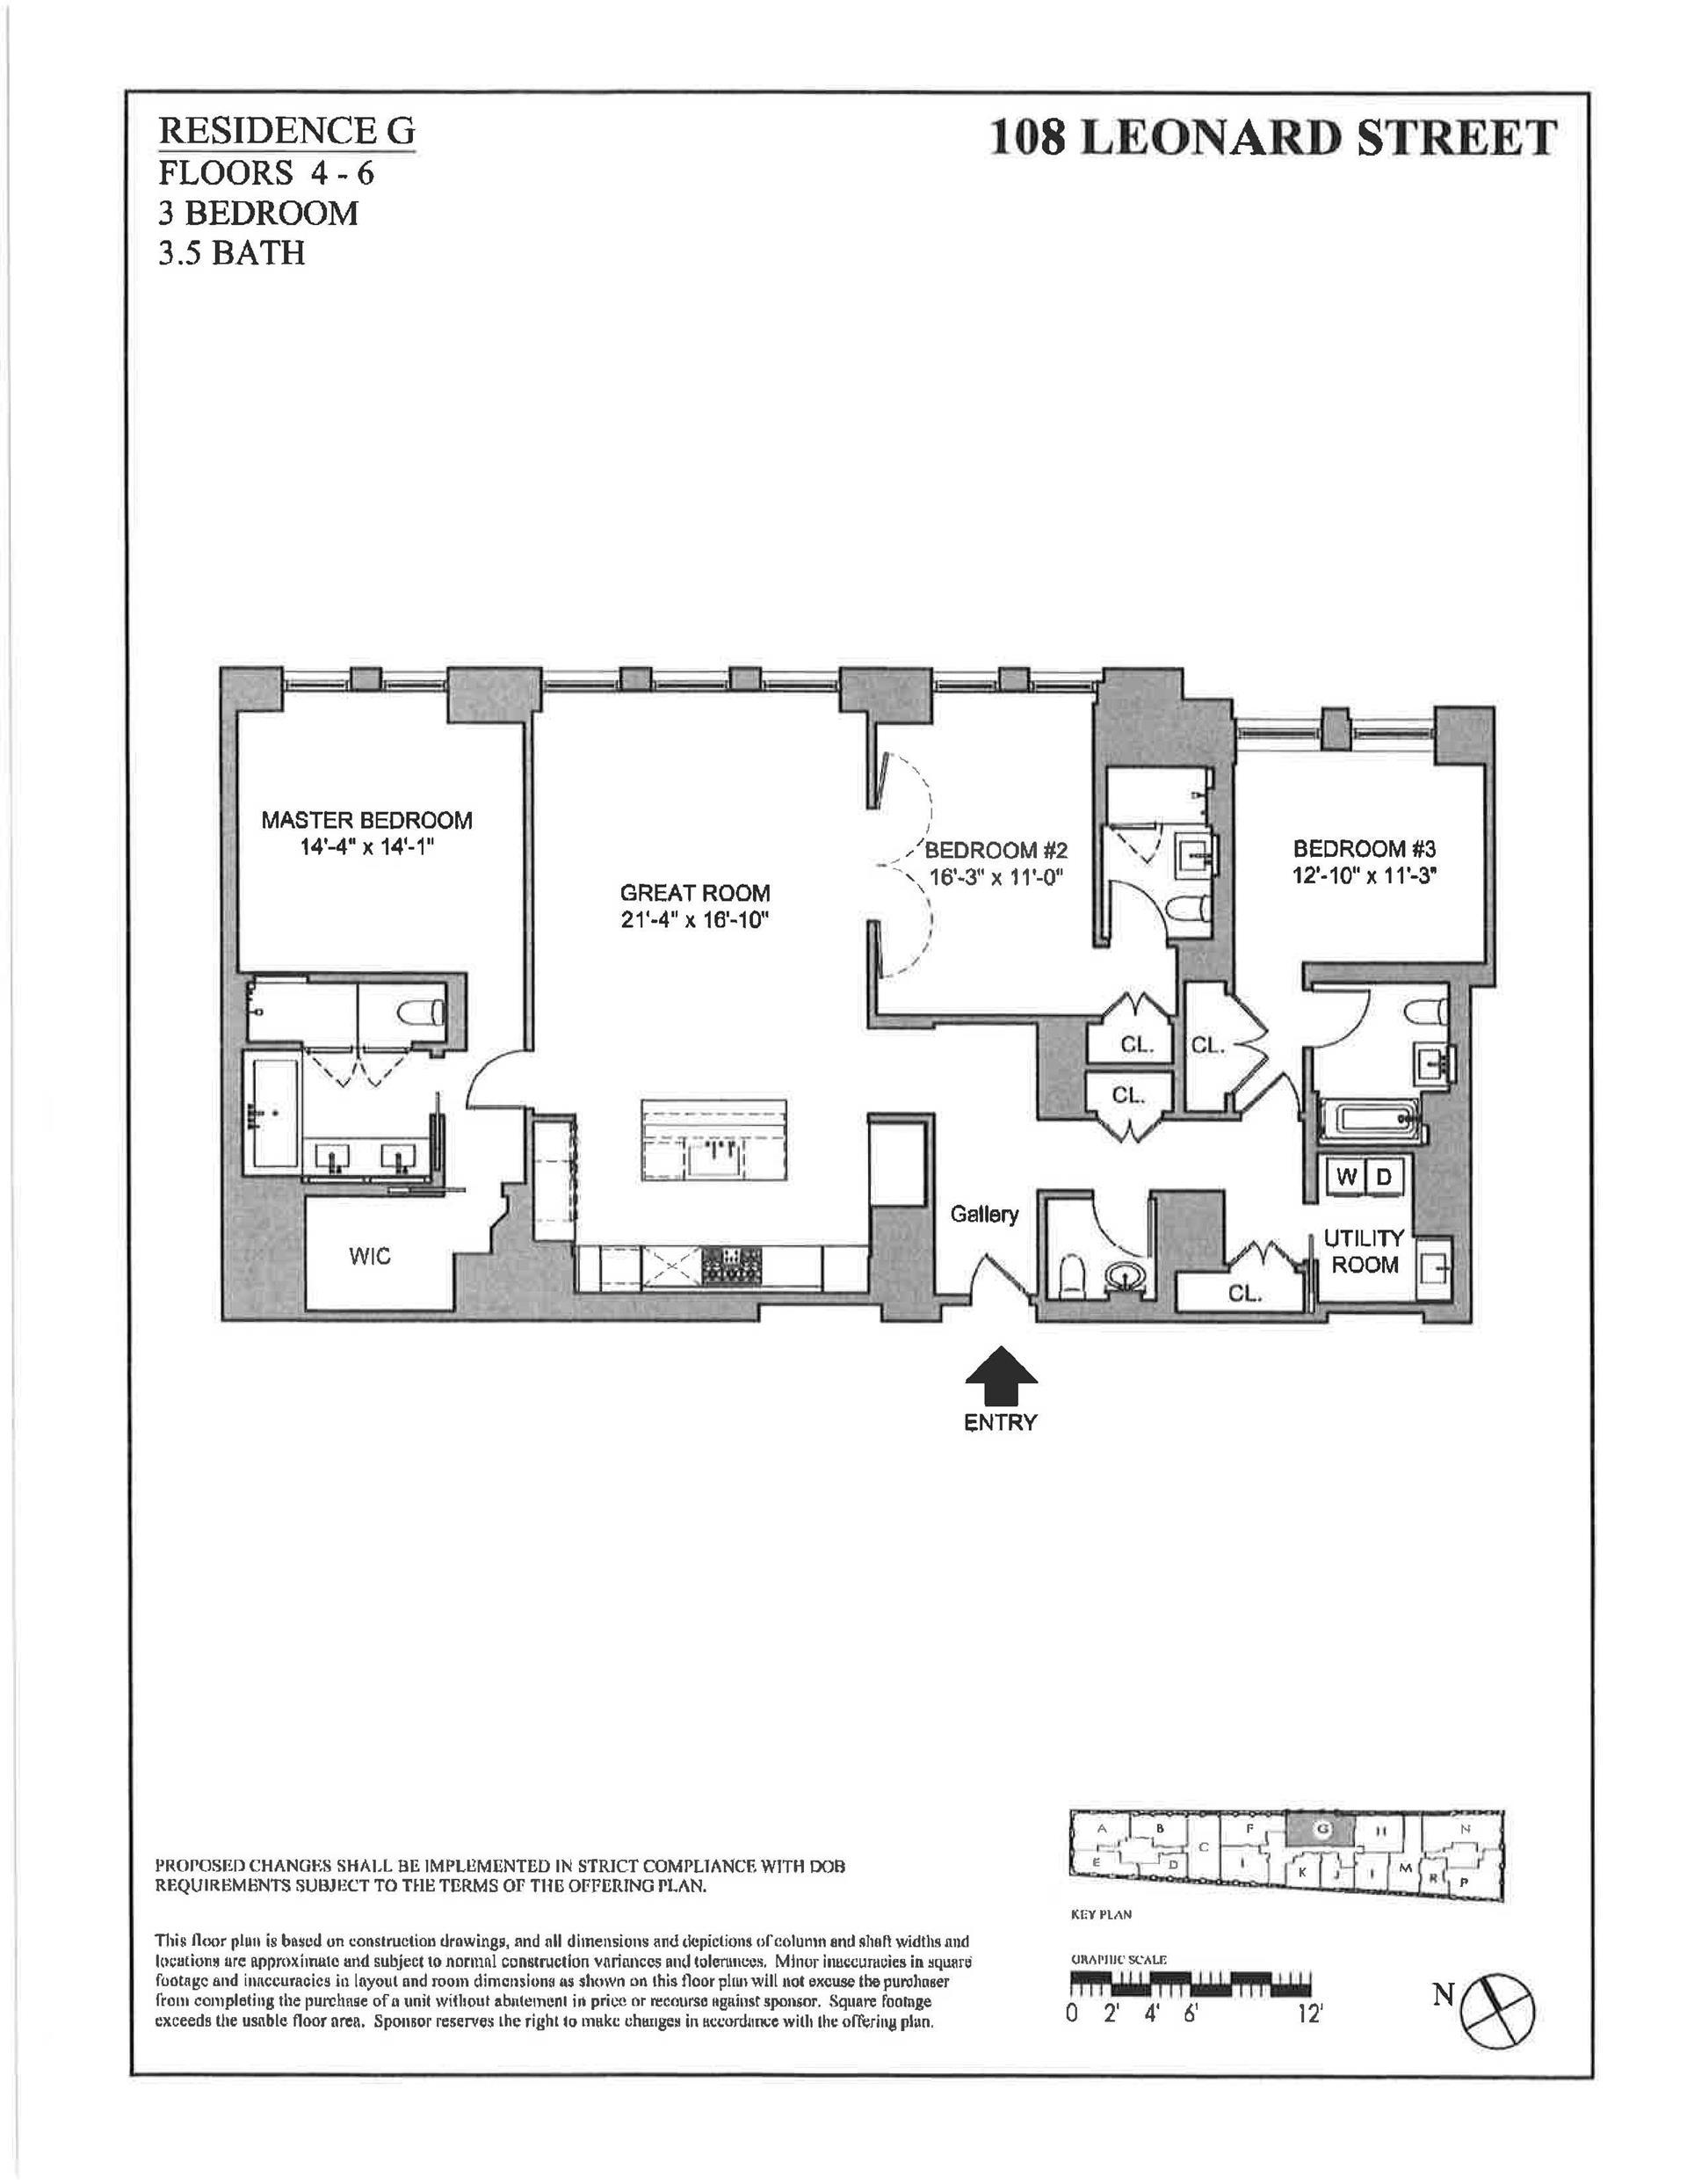 Floor plan of 108 Leonard St, 4G - TriBeCa, New York